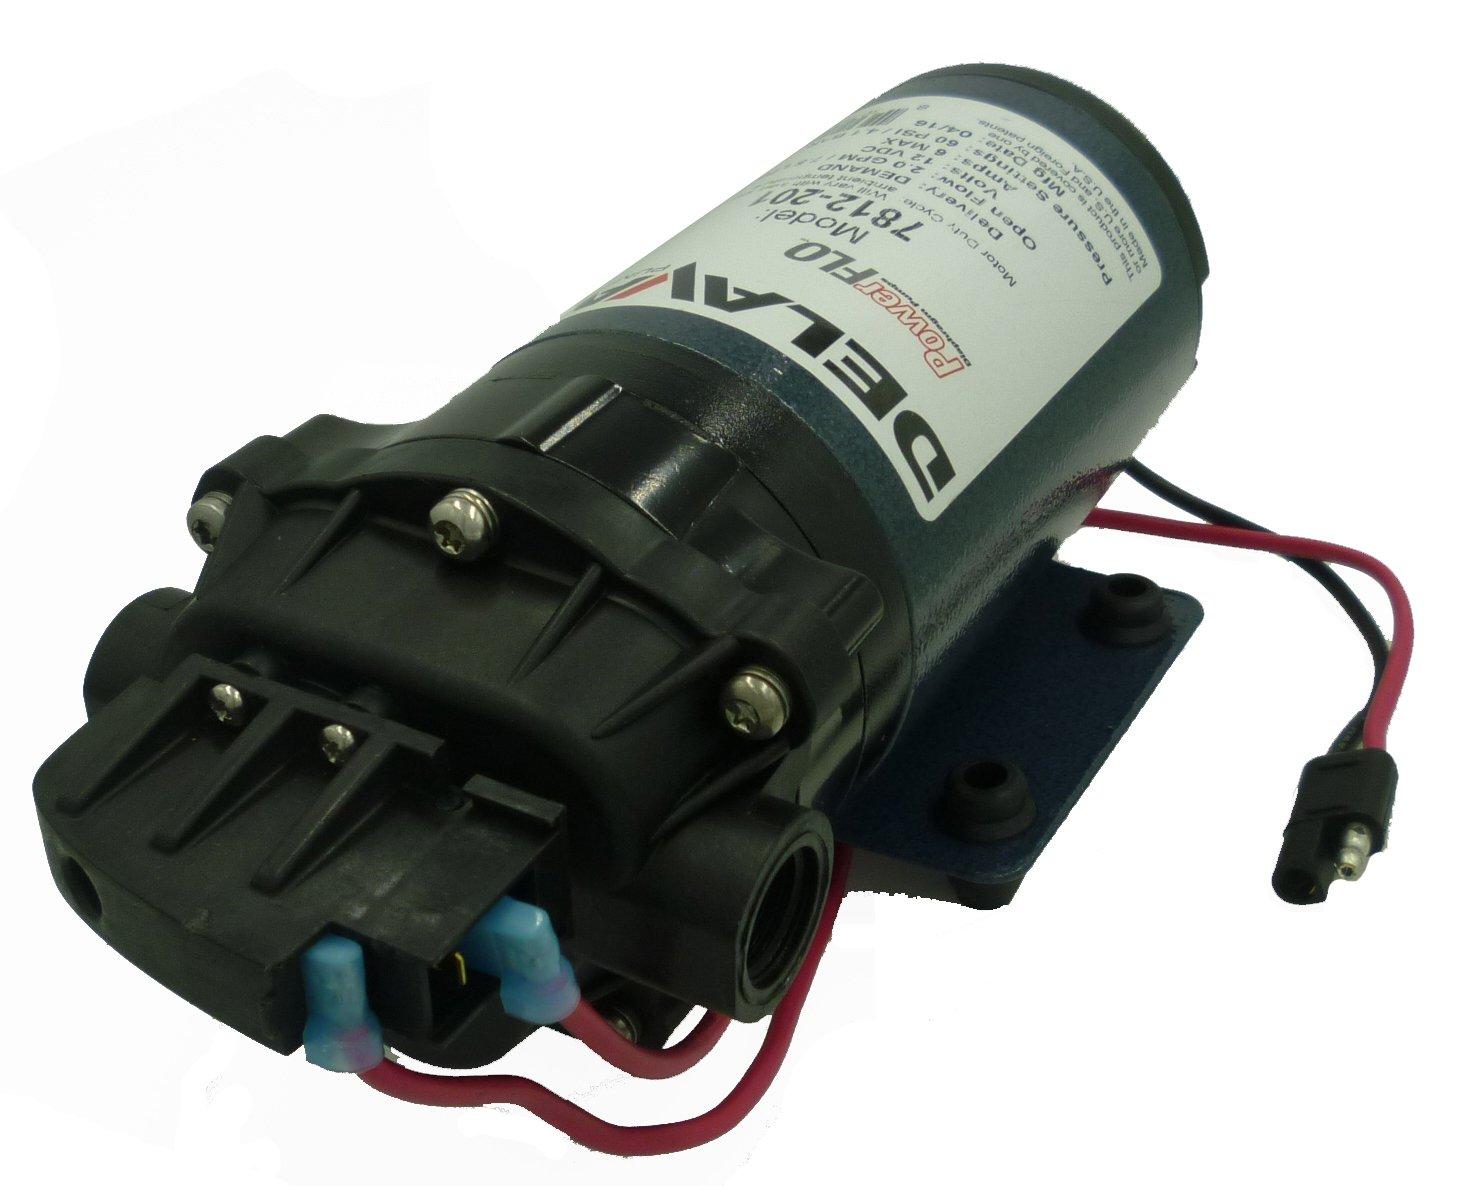 Delavan 7812-201-SB Series Diaphragm Pump 12V, 60 PSI, 2.0 GPM, Demand Pump W/ 3/8'' FNPT Ports